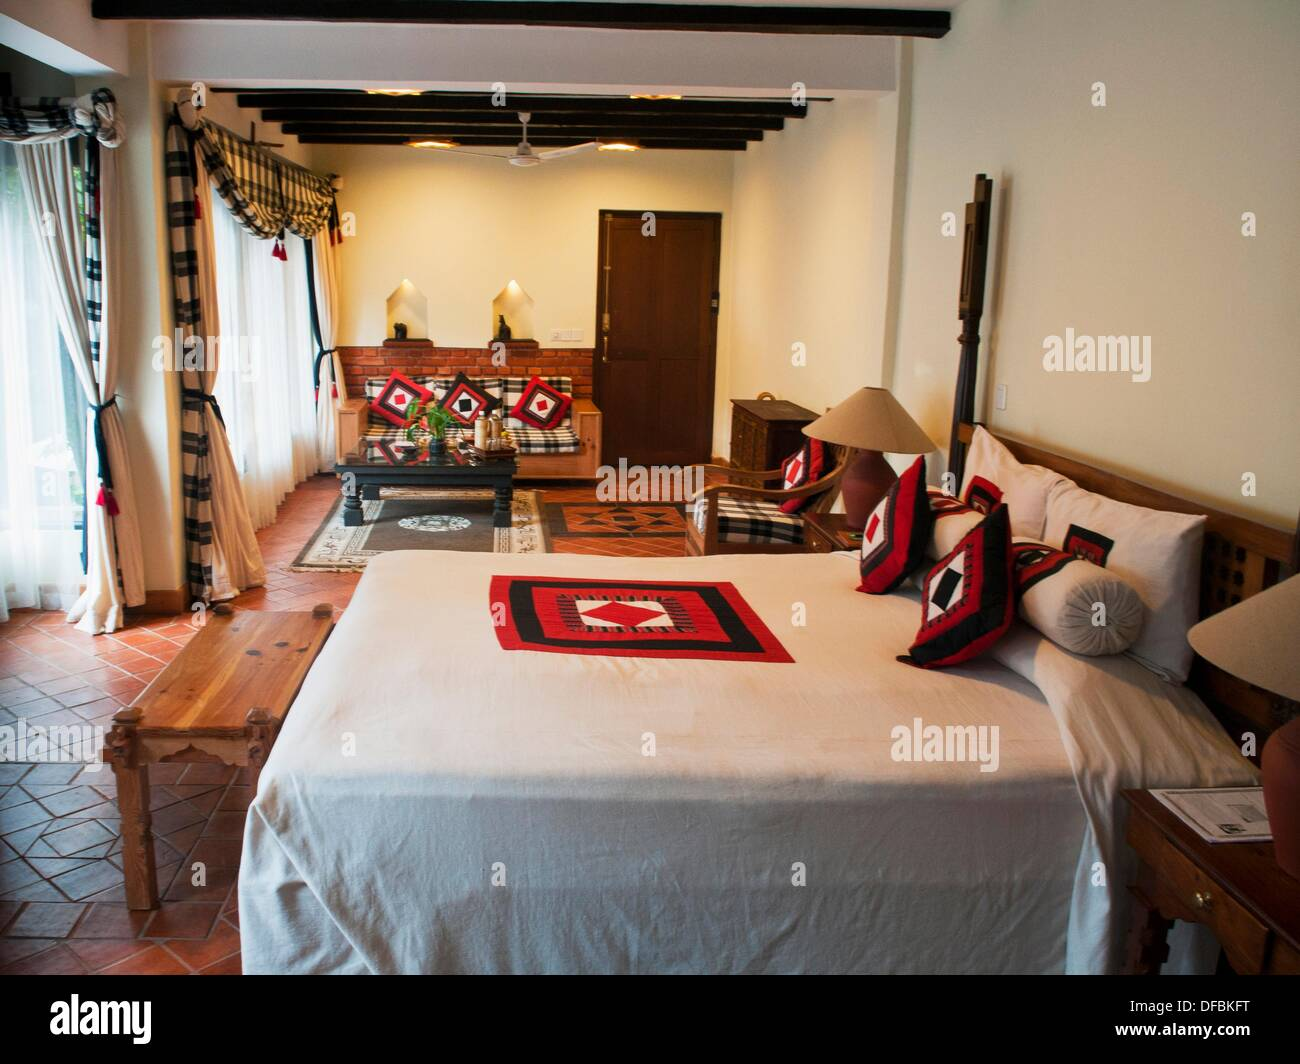 Beautiful Room At Dwarikas Resort In Kathmandu Nepal Stock Photo Alamy